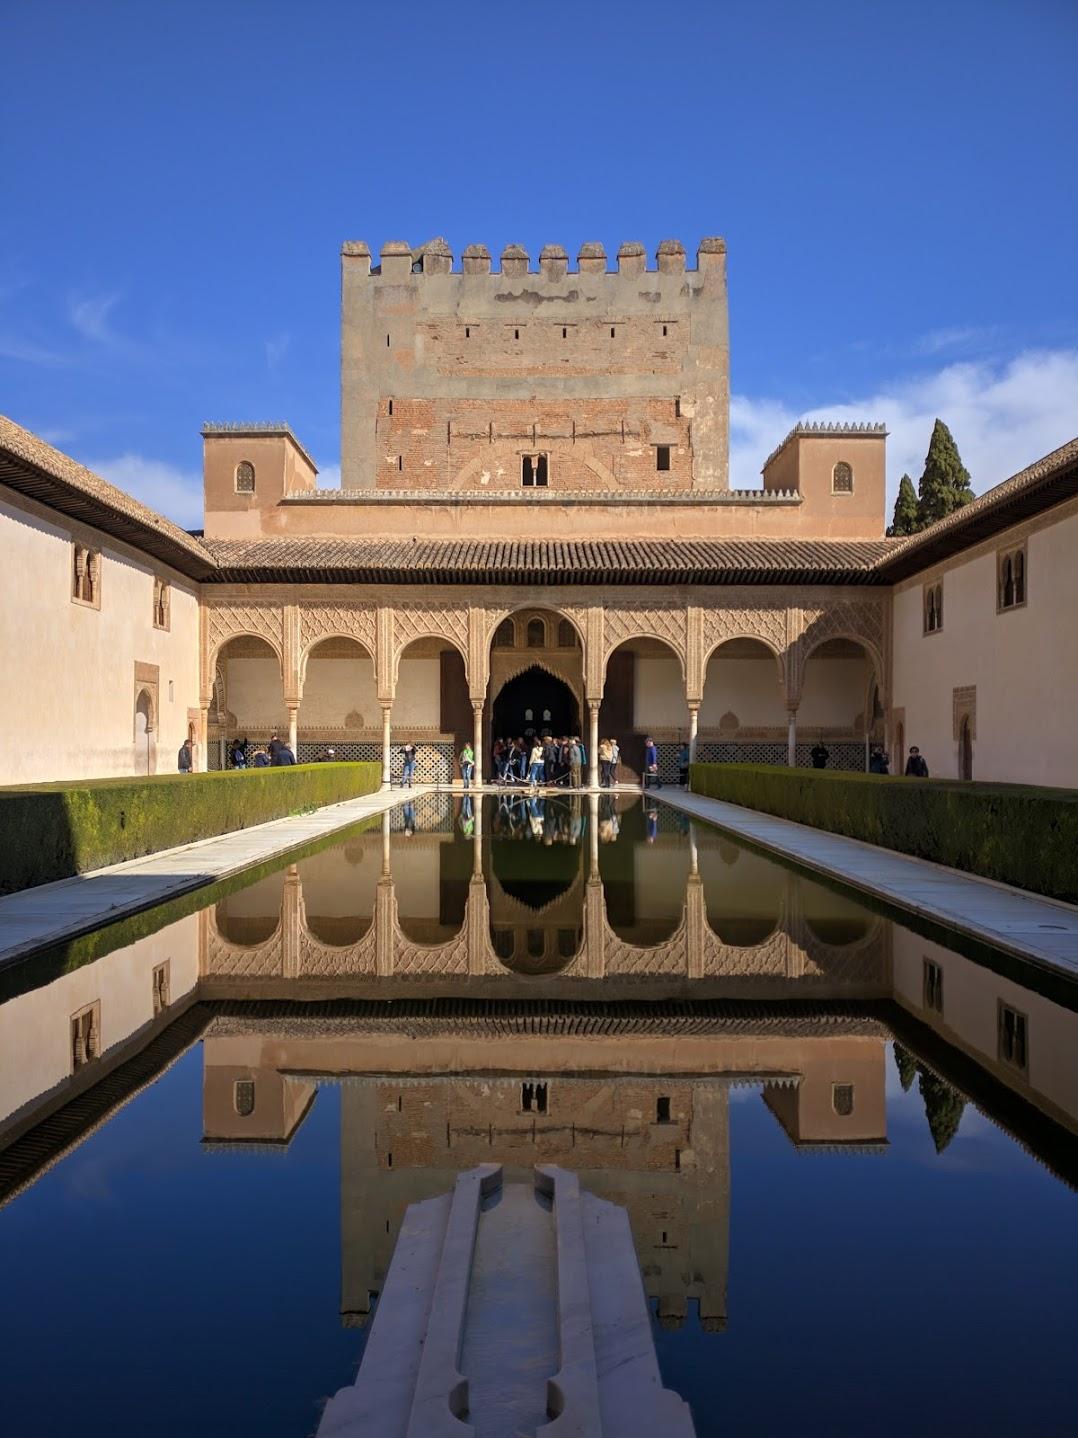 https://madrid.mattrossman.com/img/03/24/alhambra-1.jpg not found